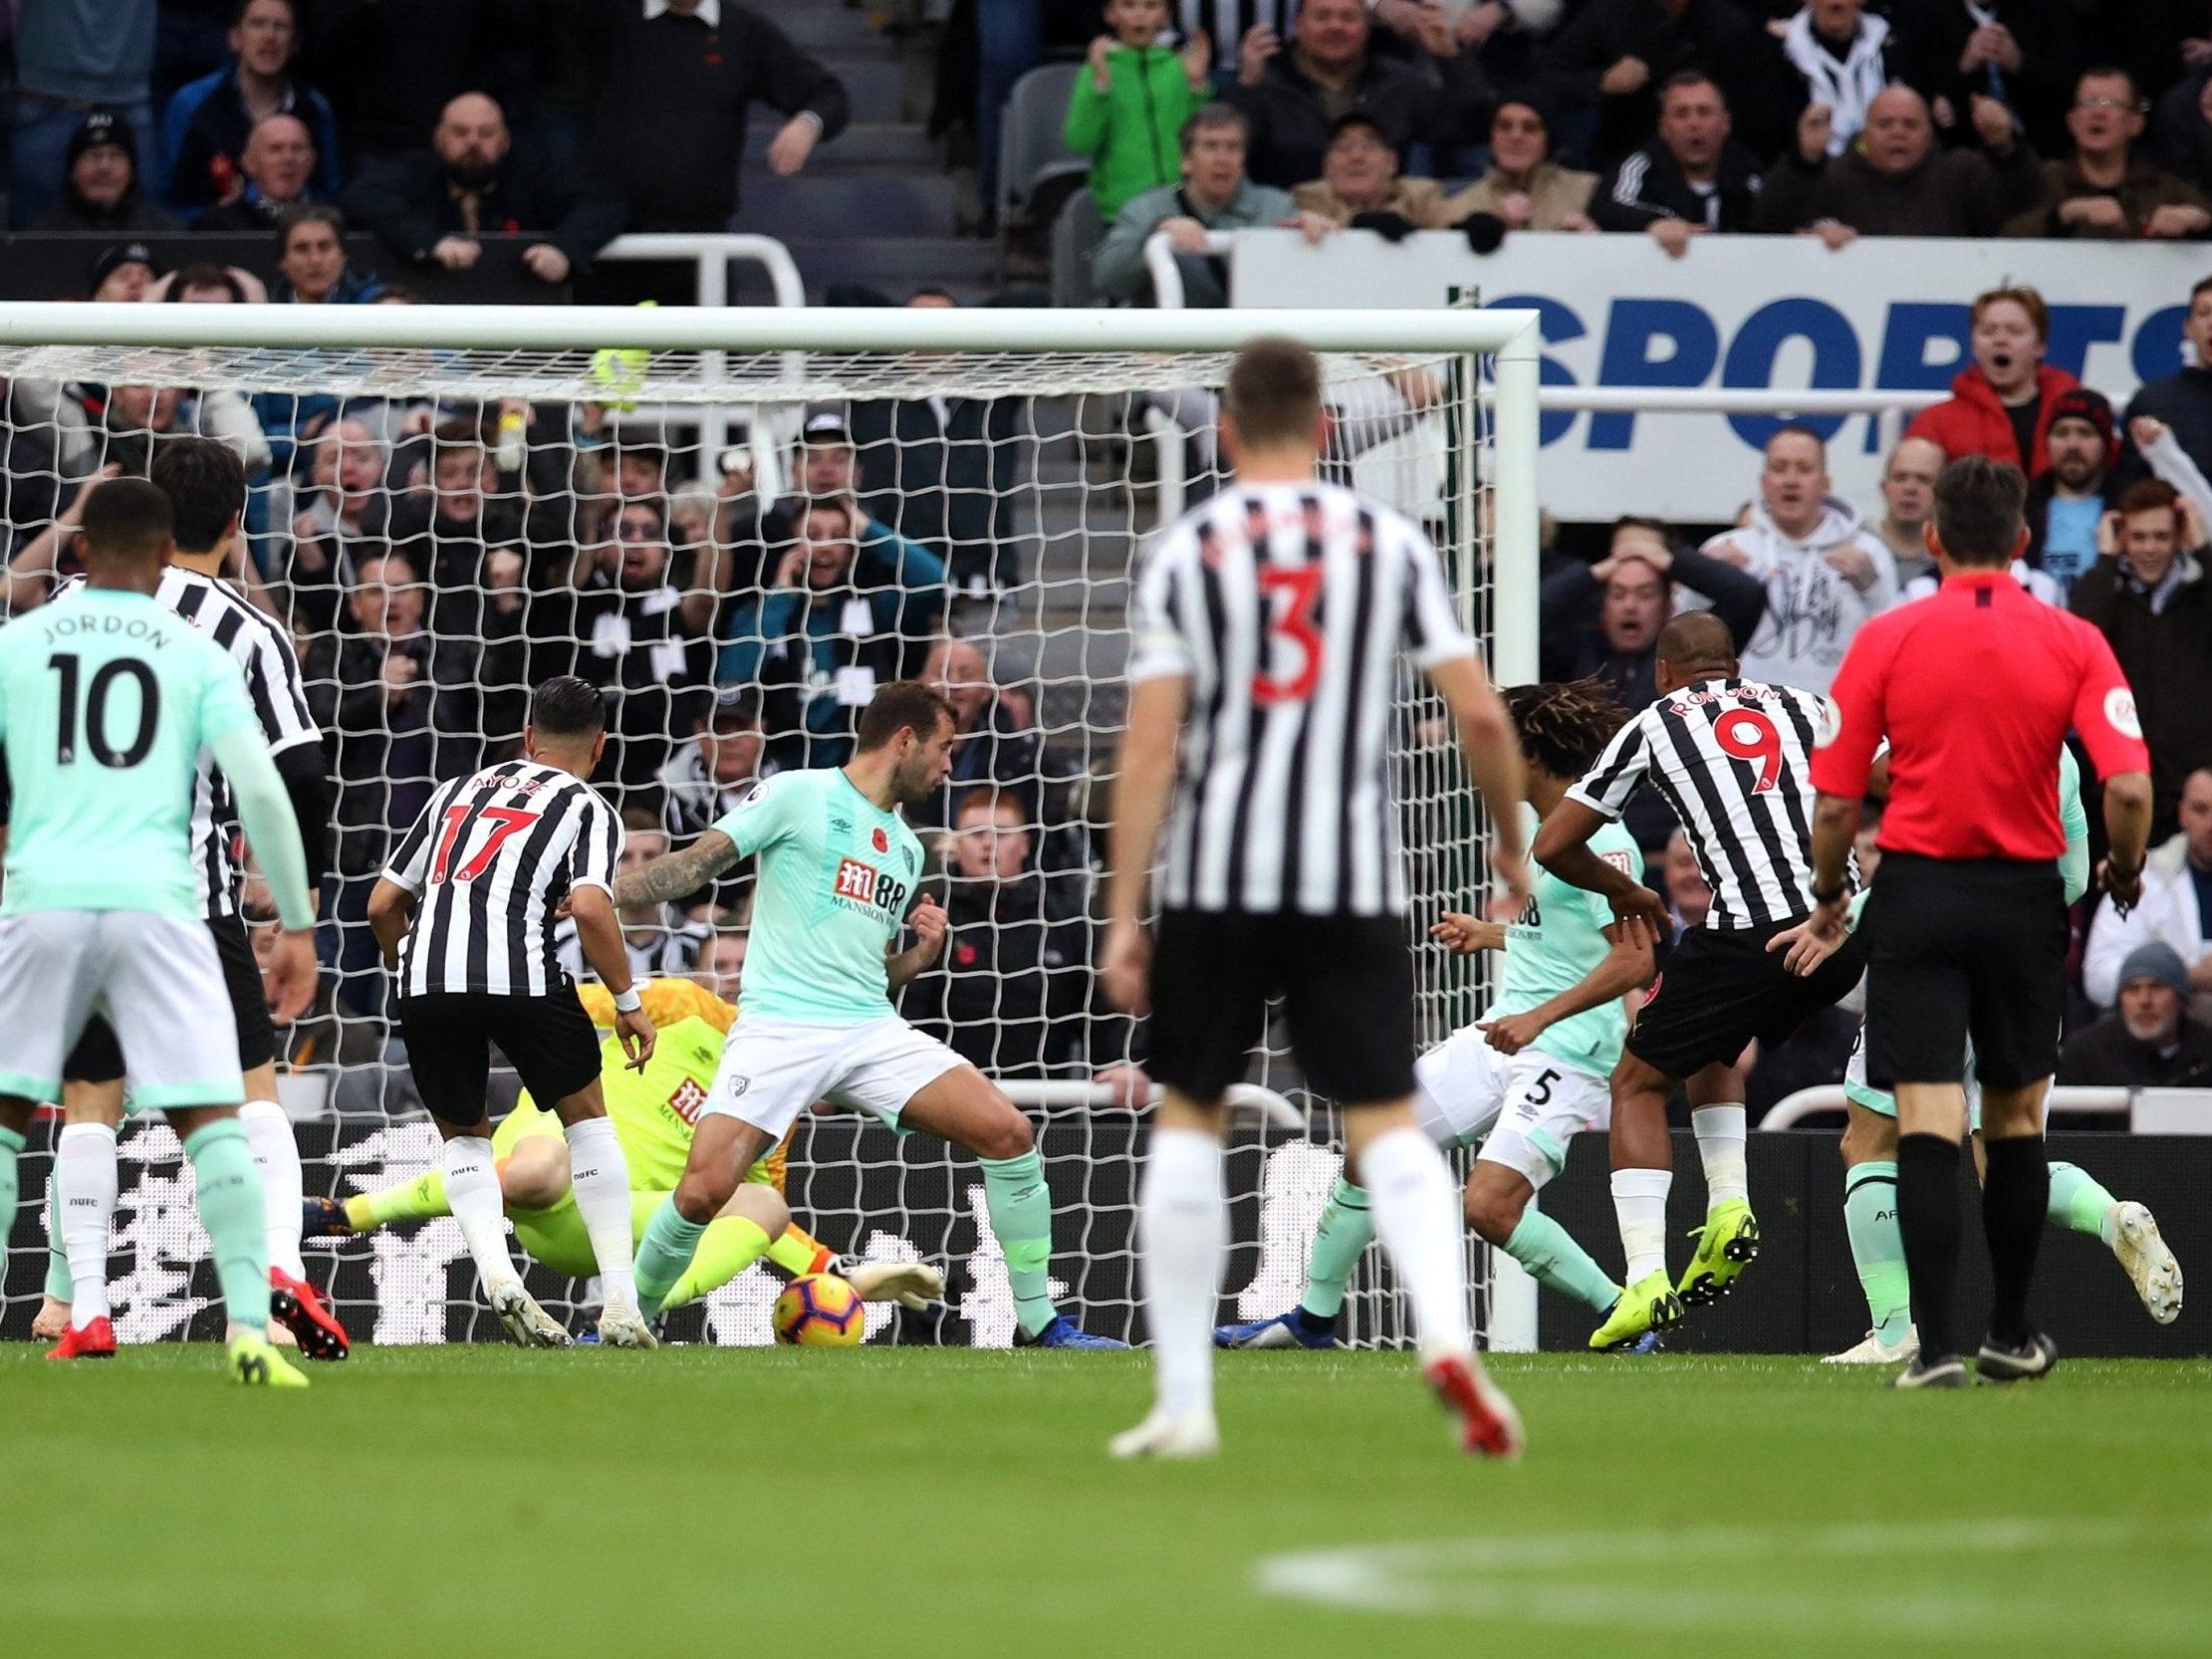 Salomon Rondon scores twice as Newcastle beat high-flying Bournemouth